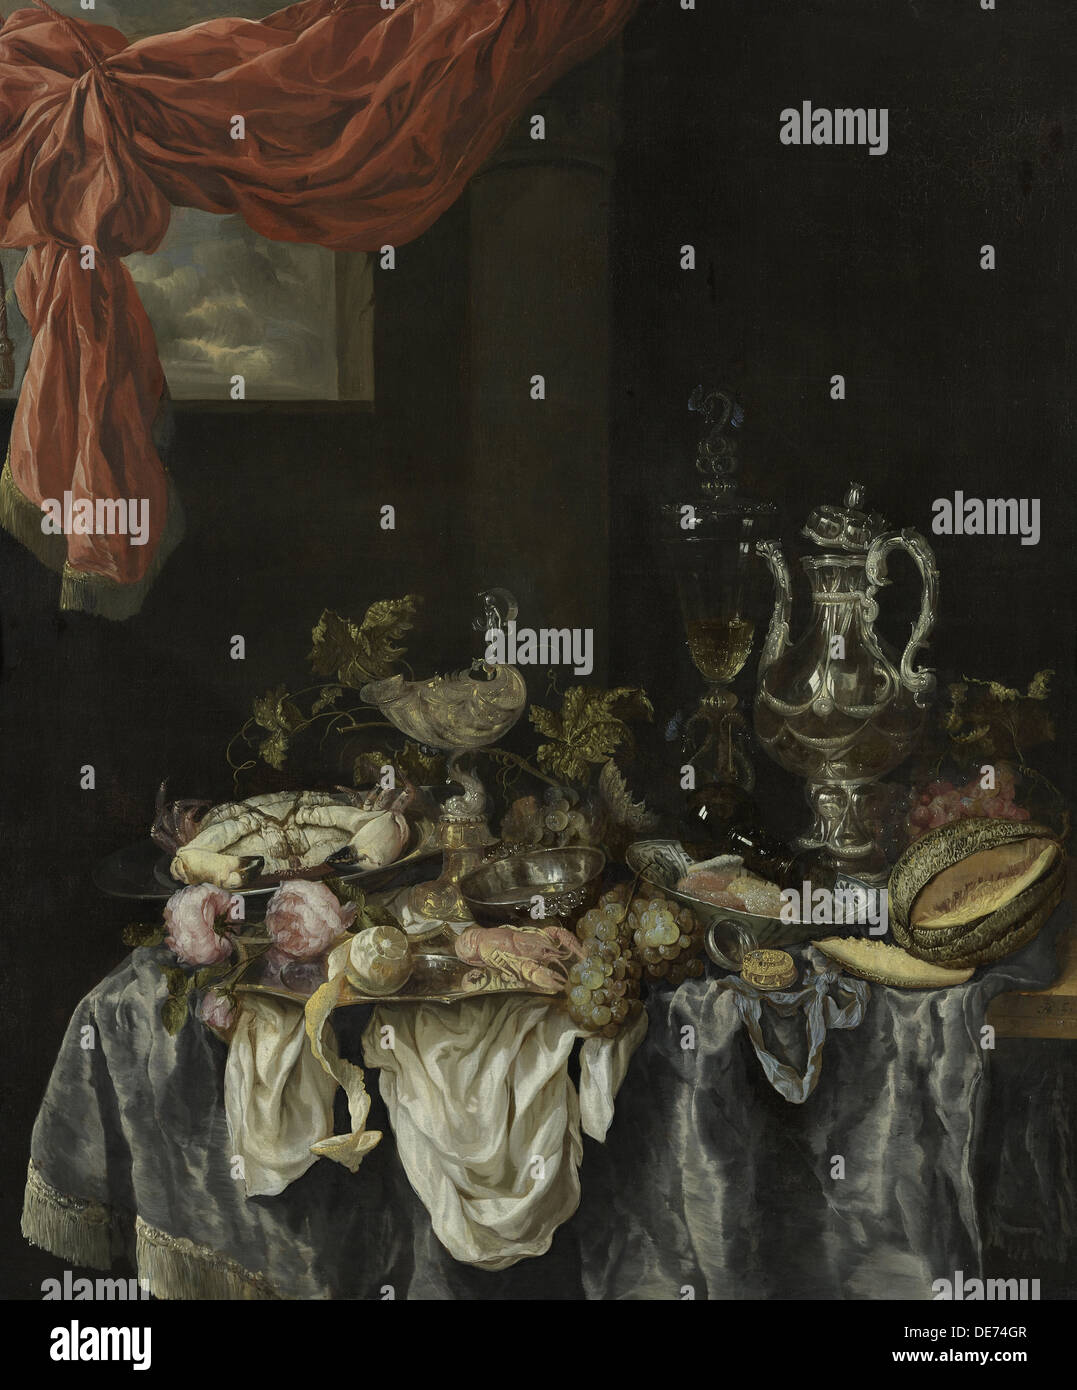 Sumptuous still life, 1654. Artist: Beijeren, Abraham Hendricksz, van (1620/21-1690) - Stock Image